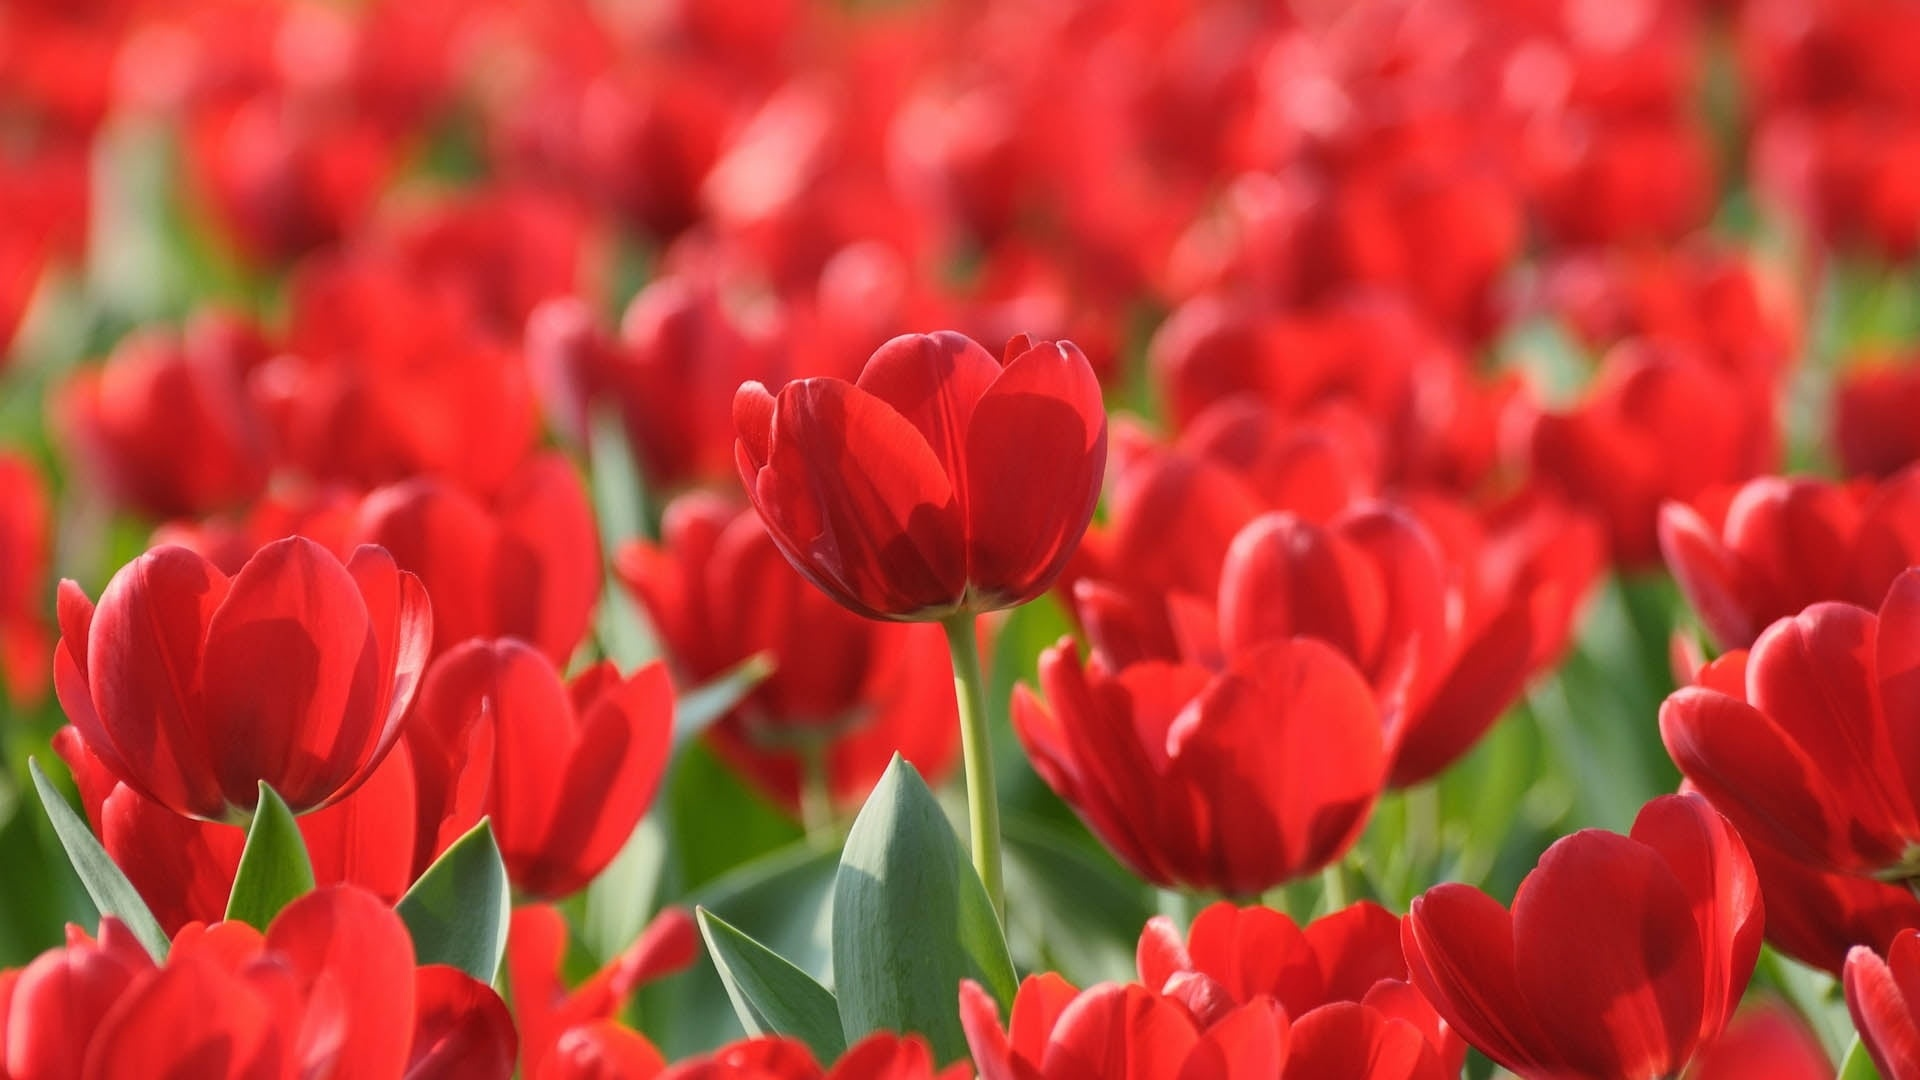 Red Flower Download Wallpaper